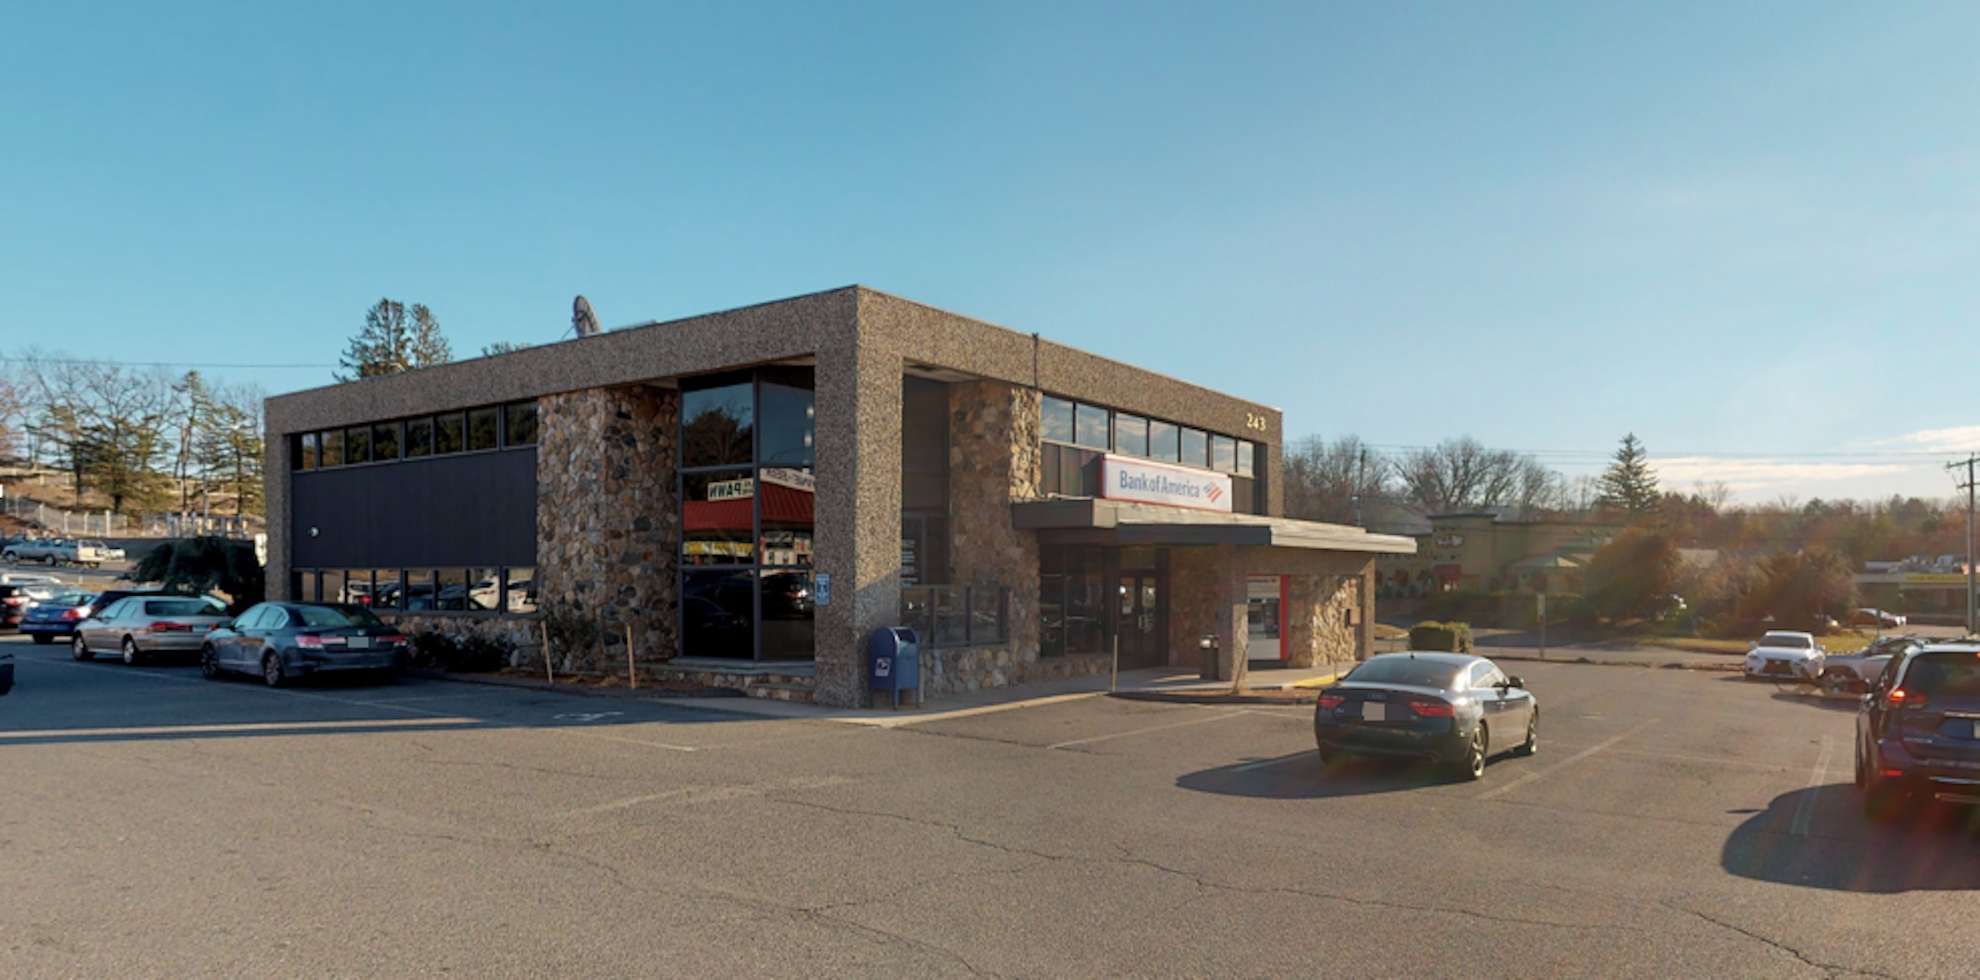 Bank of America financial center with drive-thru ATM   243 Hartford Tpke, Vernon, CT 06066